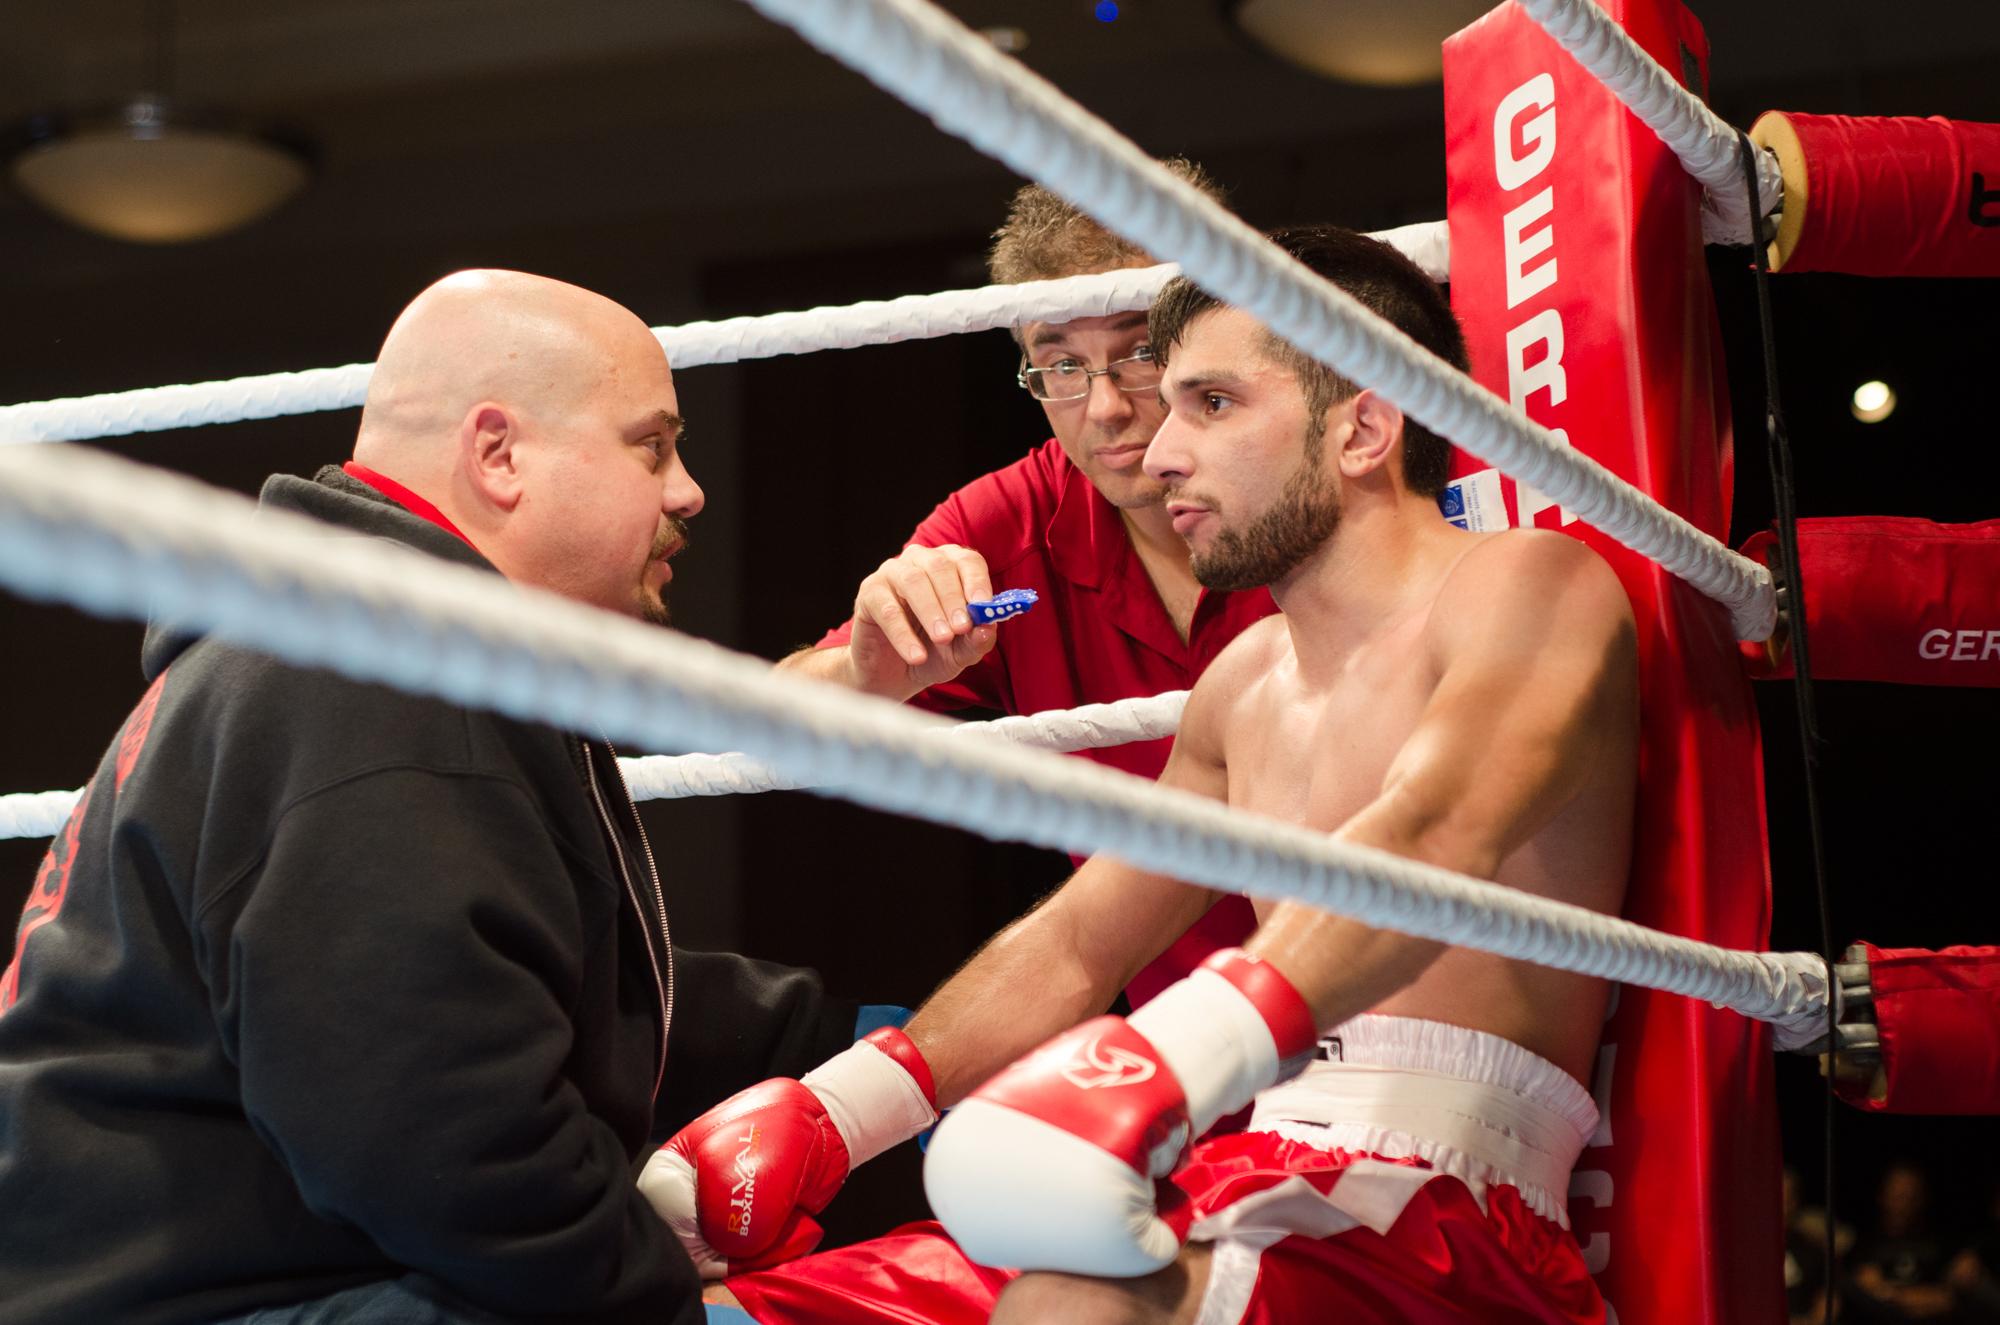 2014 11-6 Ali Fight ICC-90.jpg